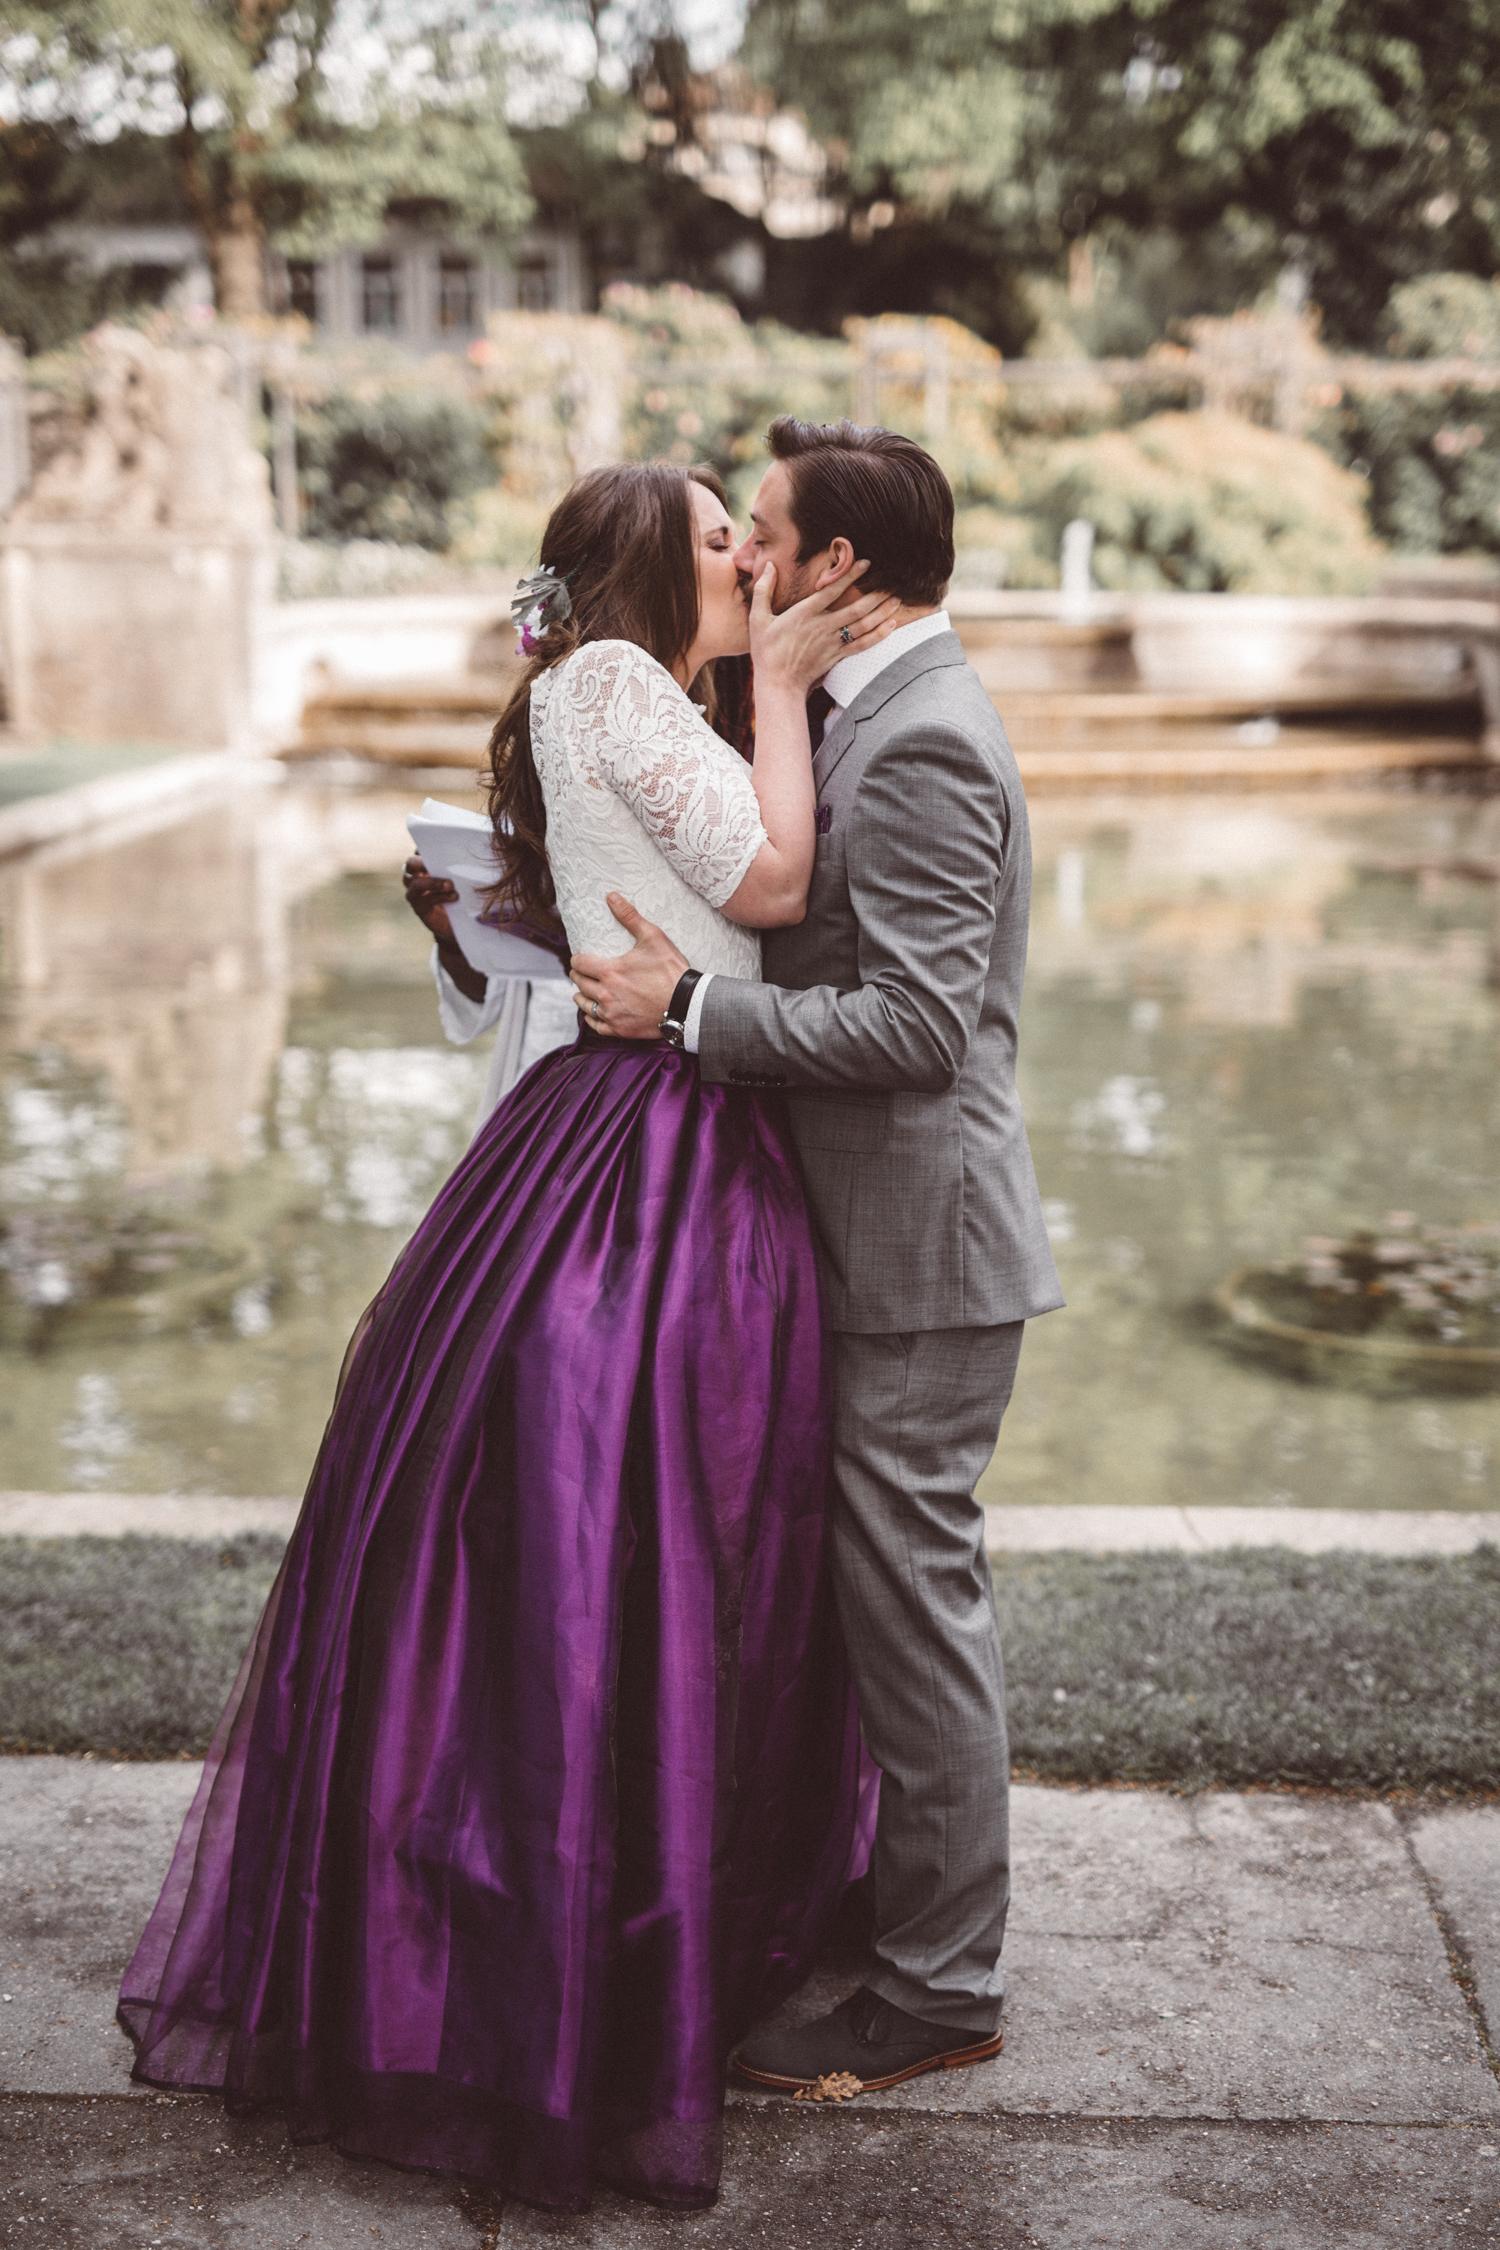 kdp_courtney&sean_wed_web-38.jpg